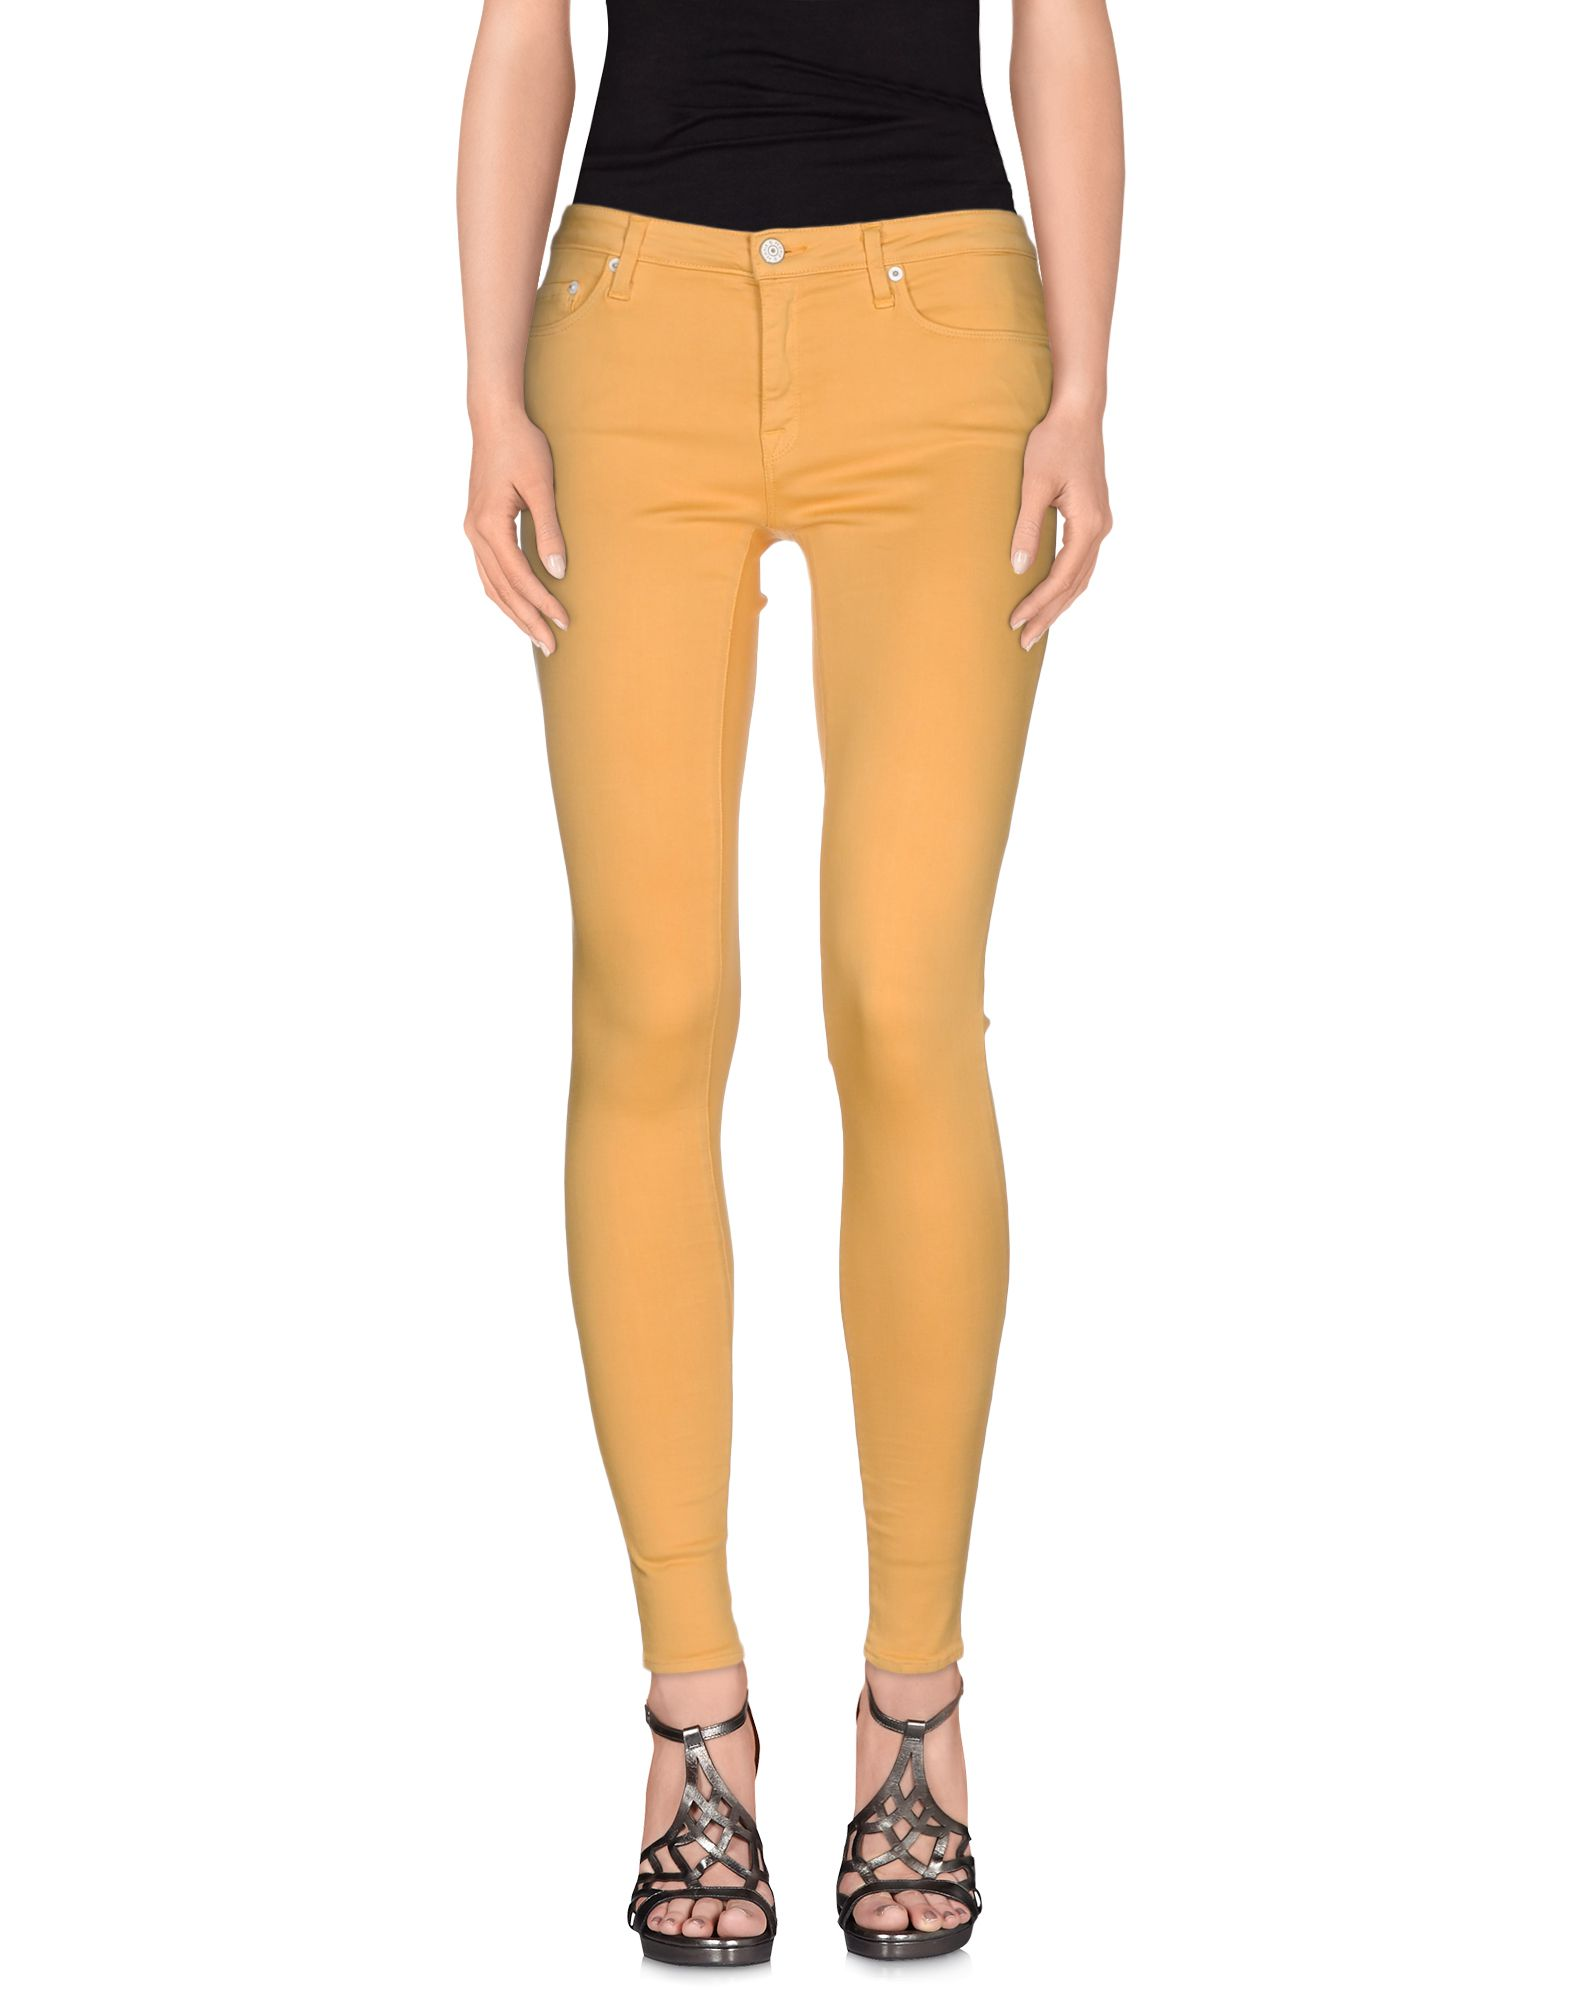 Pantaloni Jeans (+) People Donna - Acquista online su PxcoQuNbek